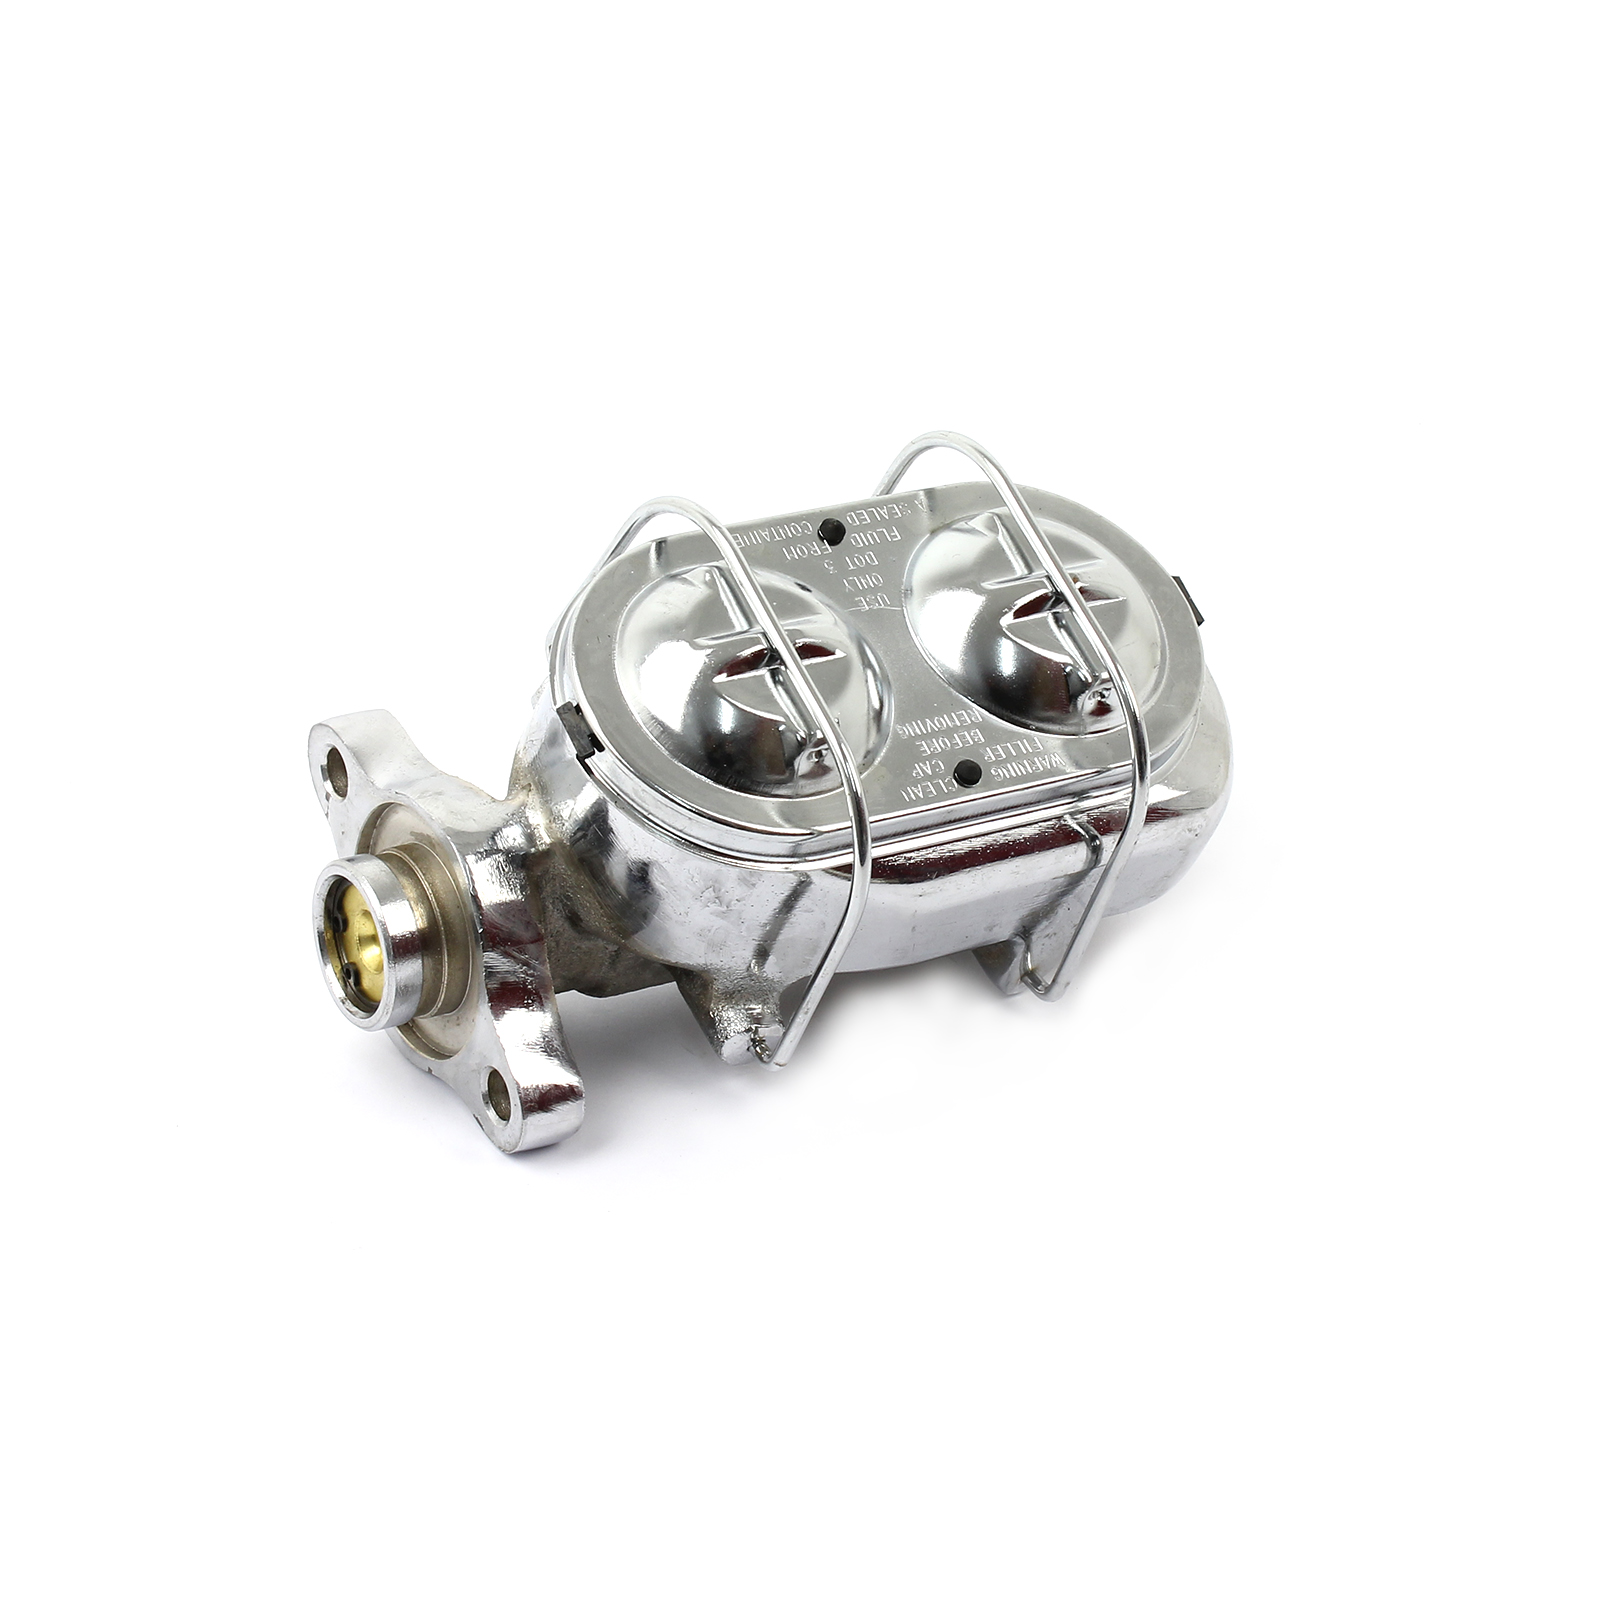 Universal Gm Clip On Top Steel Brake Master Cylinder Chrome